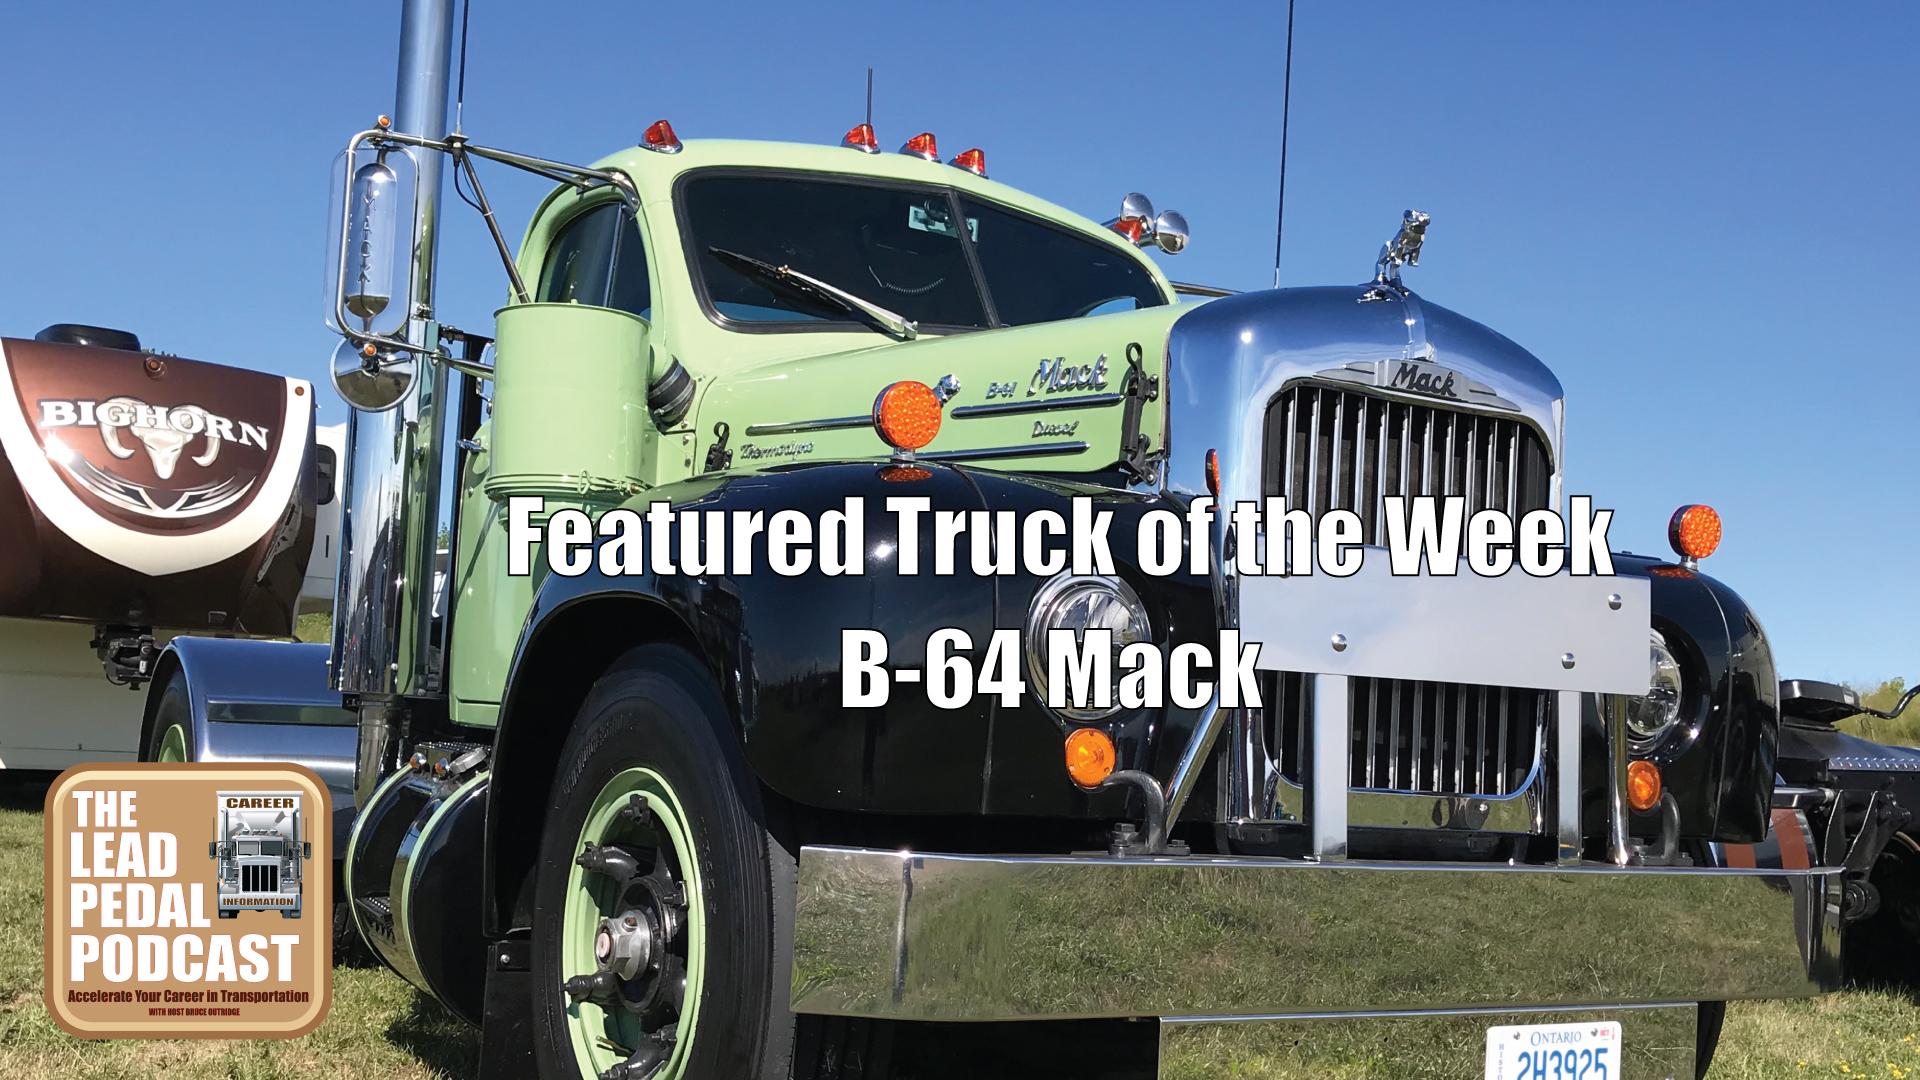 B-64 Mack